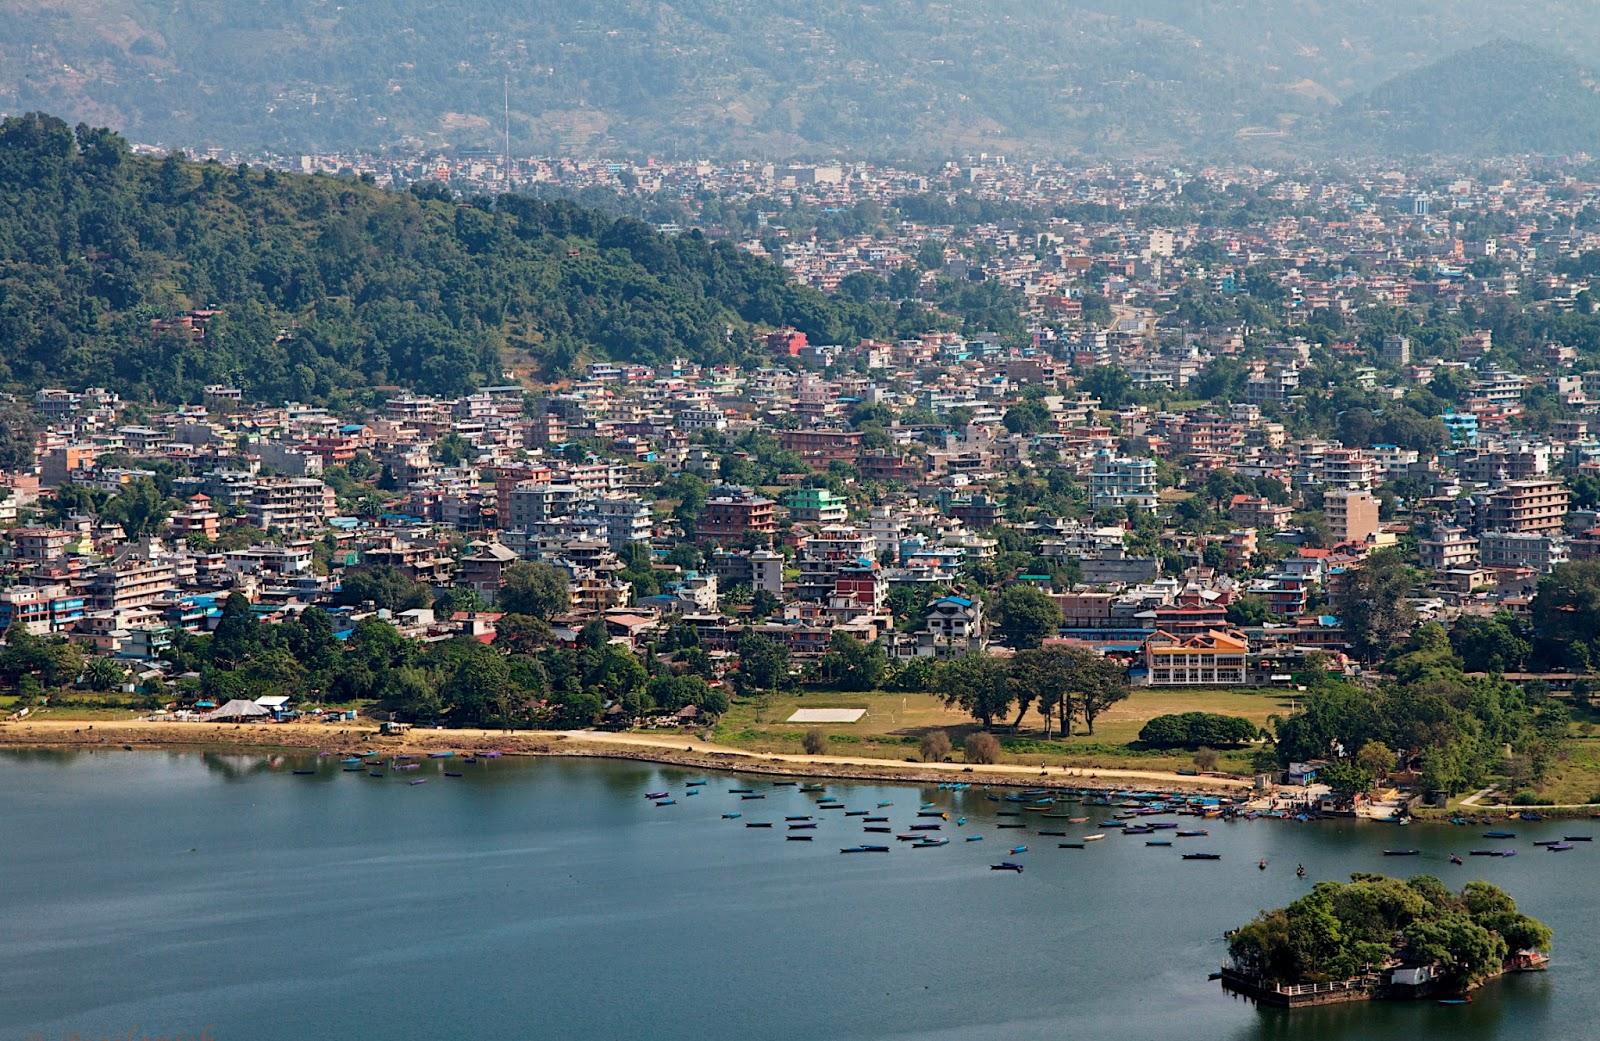 Pokhara Nepal  city images : ... to Pokhara city, Pokhara valley, Nepal नेपाल , Asia